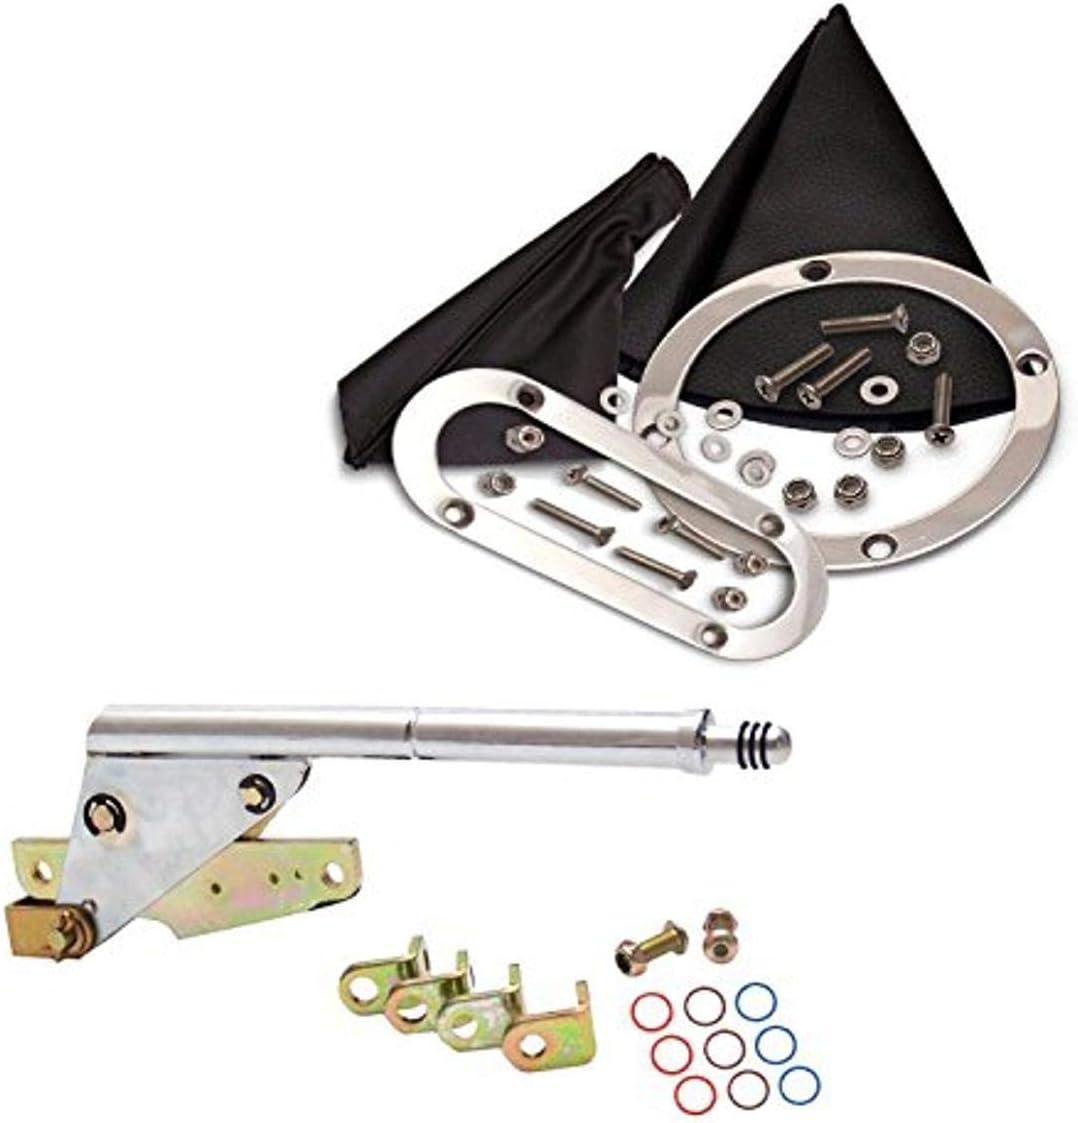 American Shifter 485385 Kit Max 77% OFF 2004R Swan Trim Brake 23 Sales for sale E